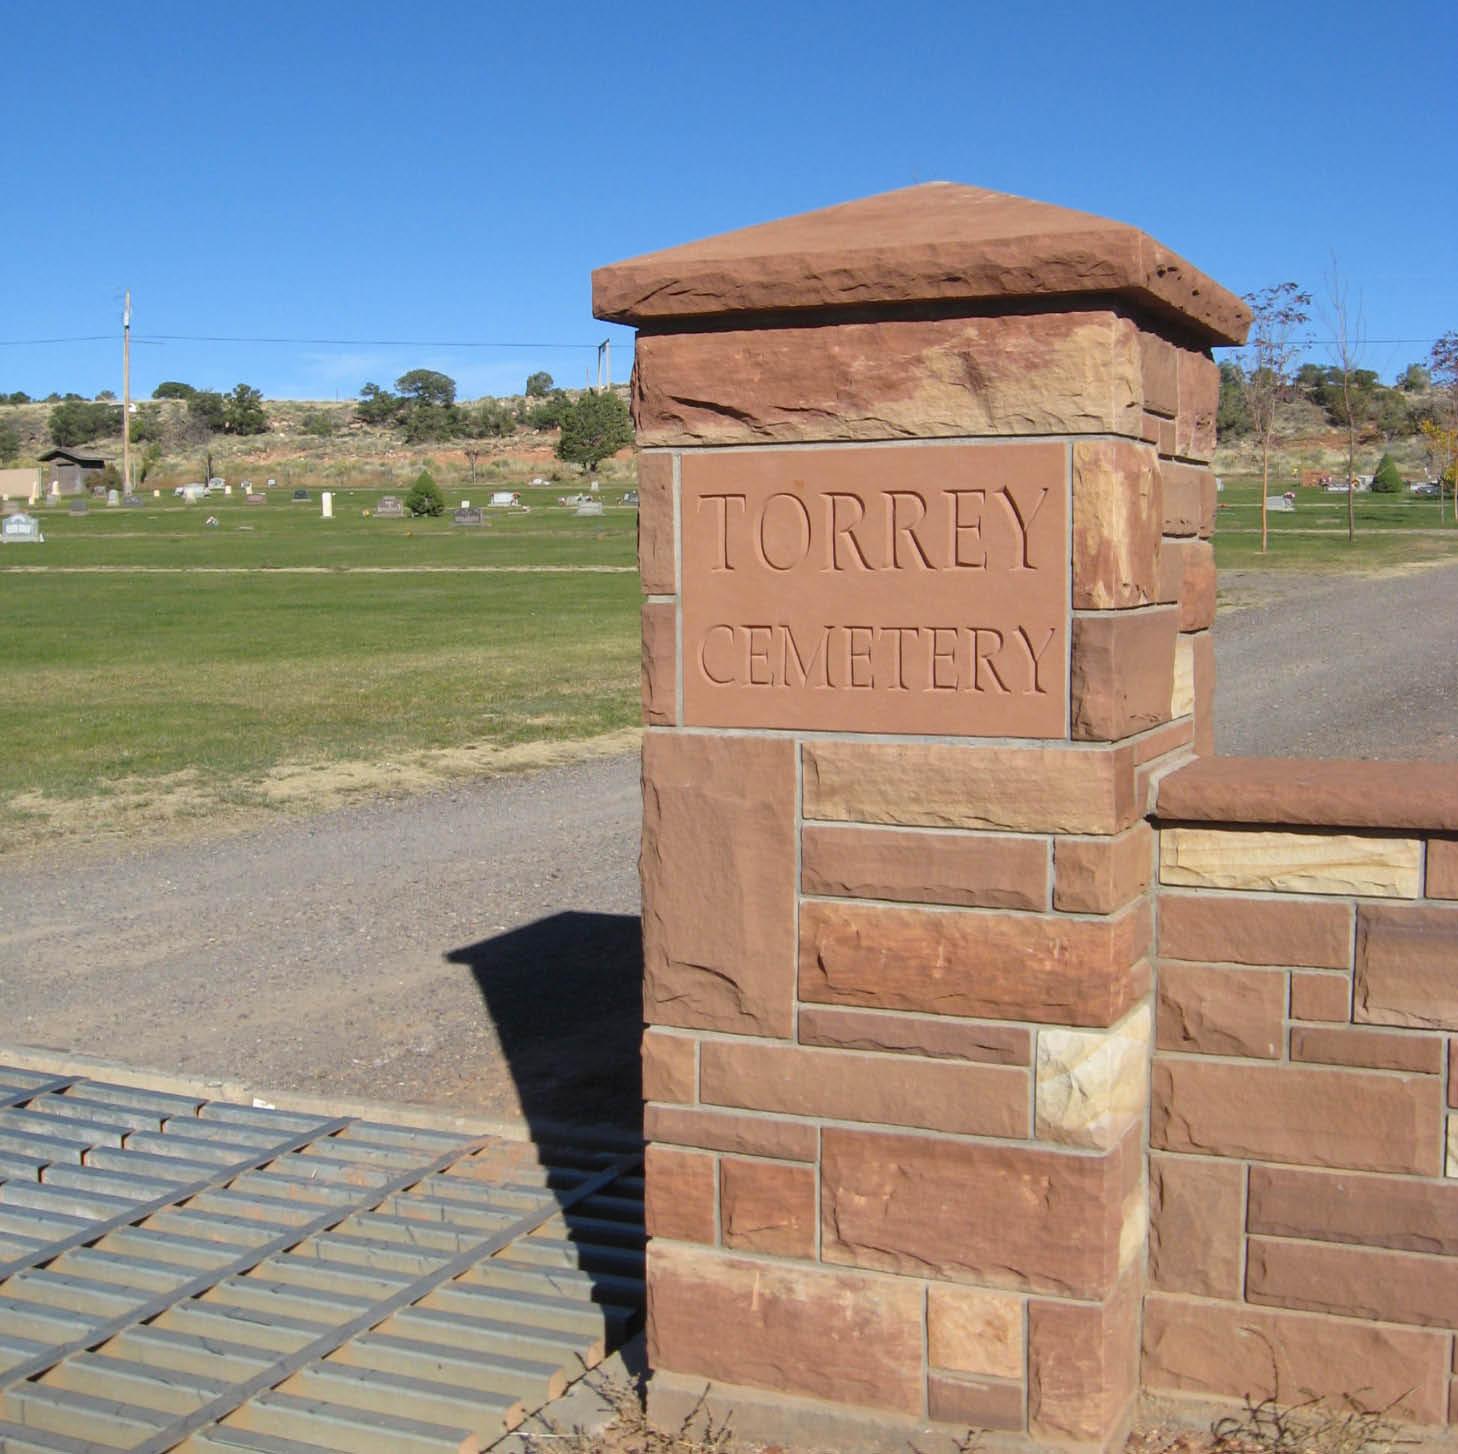 Torrey Cemetery